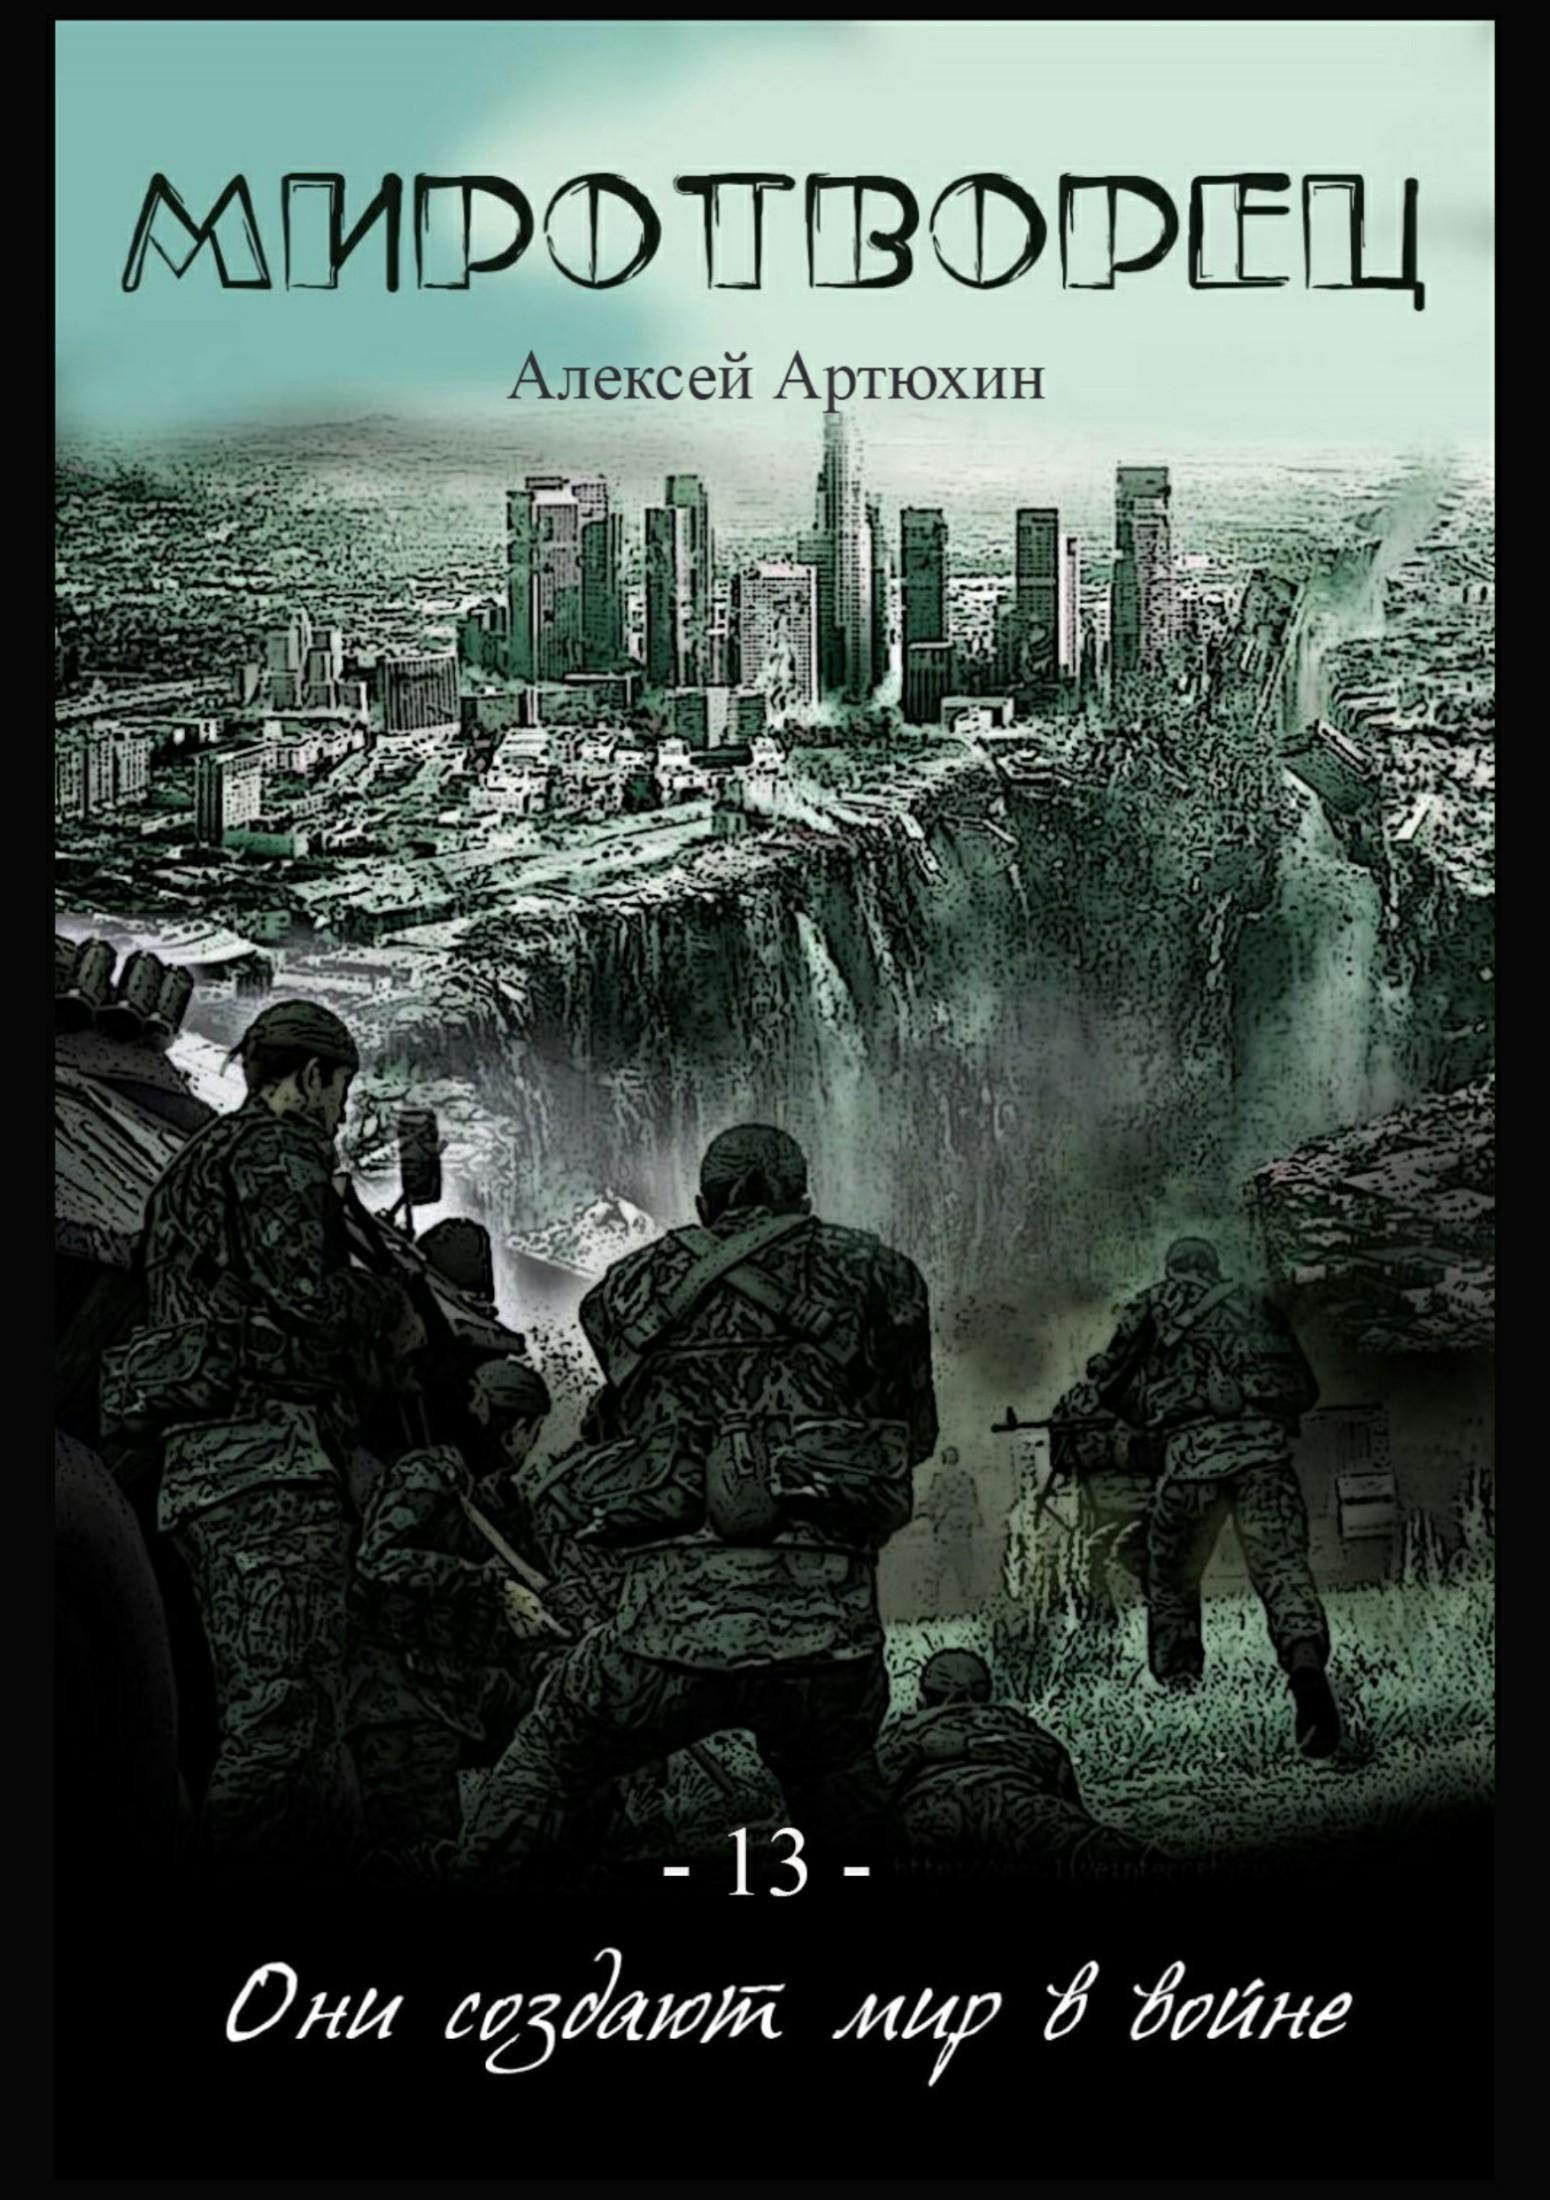 Алексей Артюхин - Миротворец